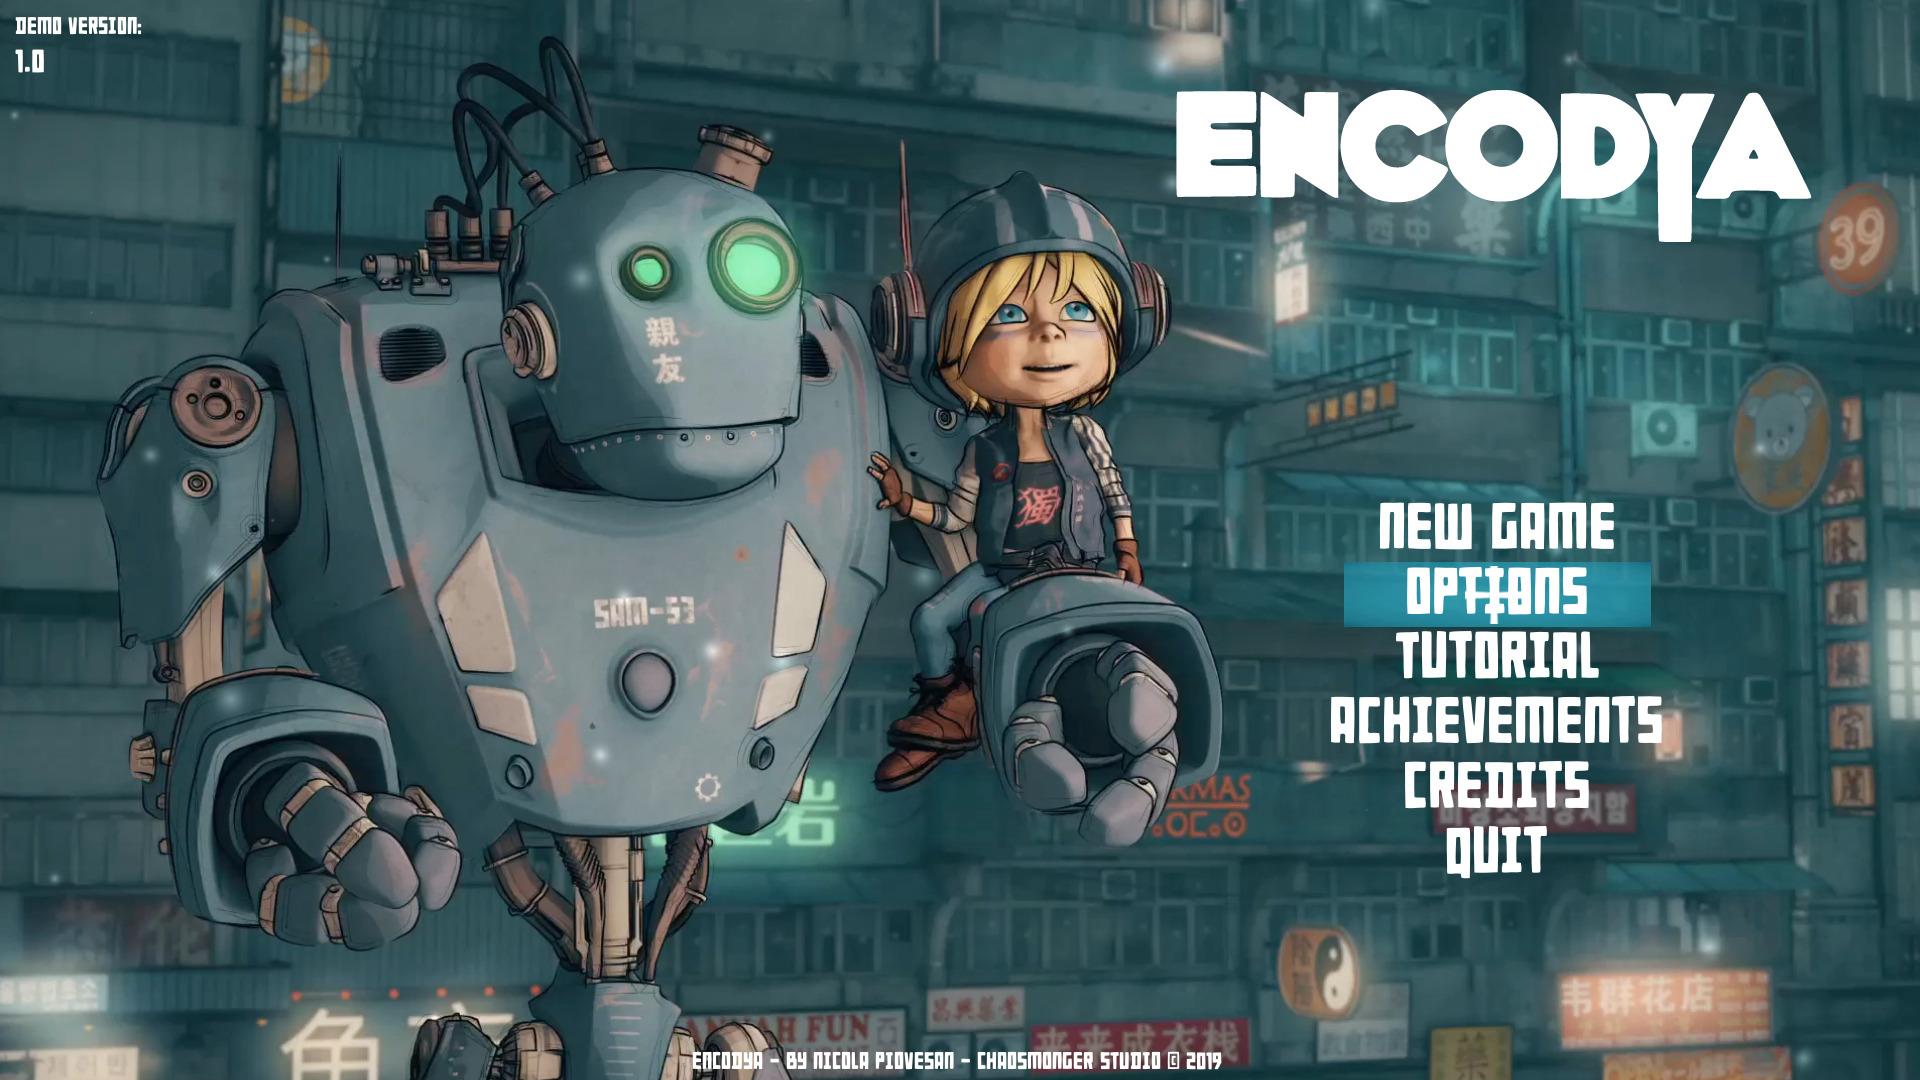 encodya-0.jpg